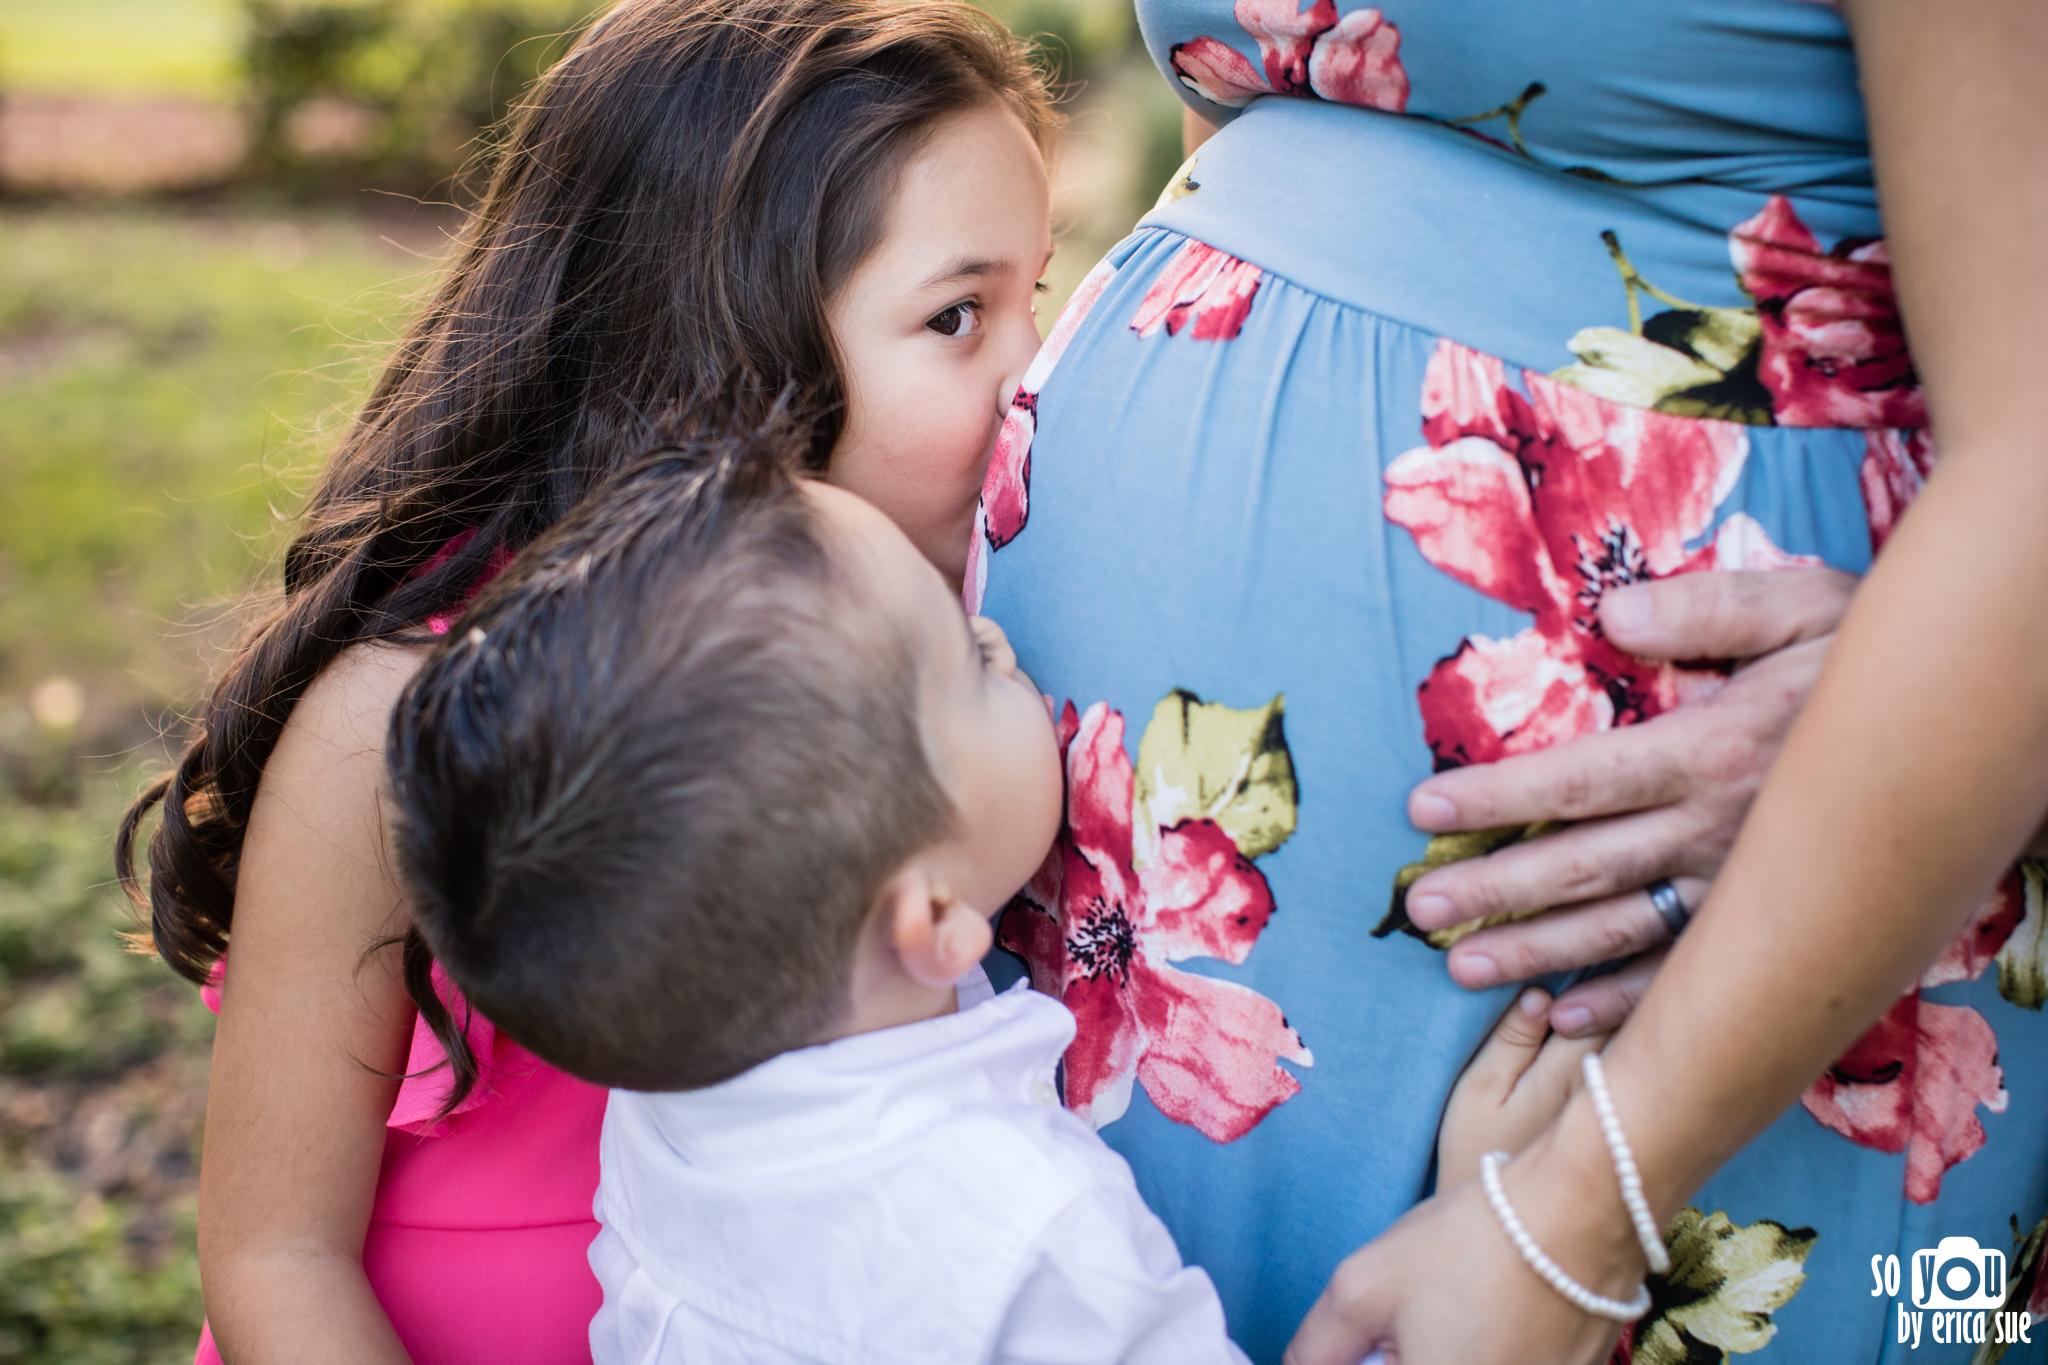 so-you-by-erica-sue-davie-maternity-photographer-fl-6758.jpg